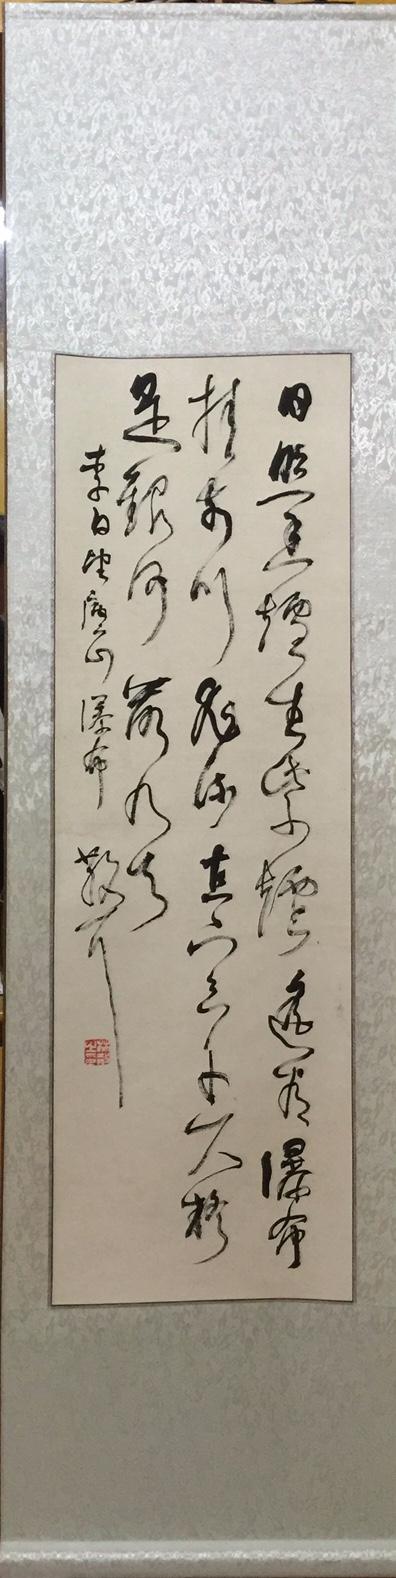 Lin Sanzhi(), Calligraphy in Cursive Script